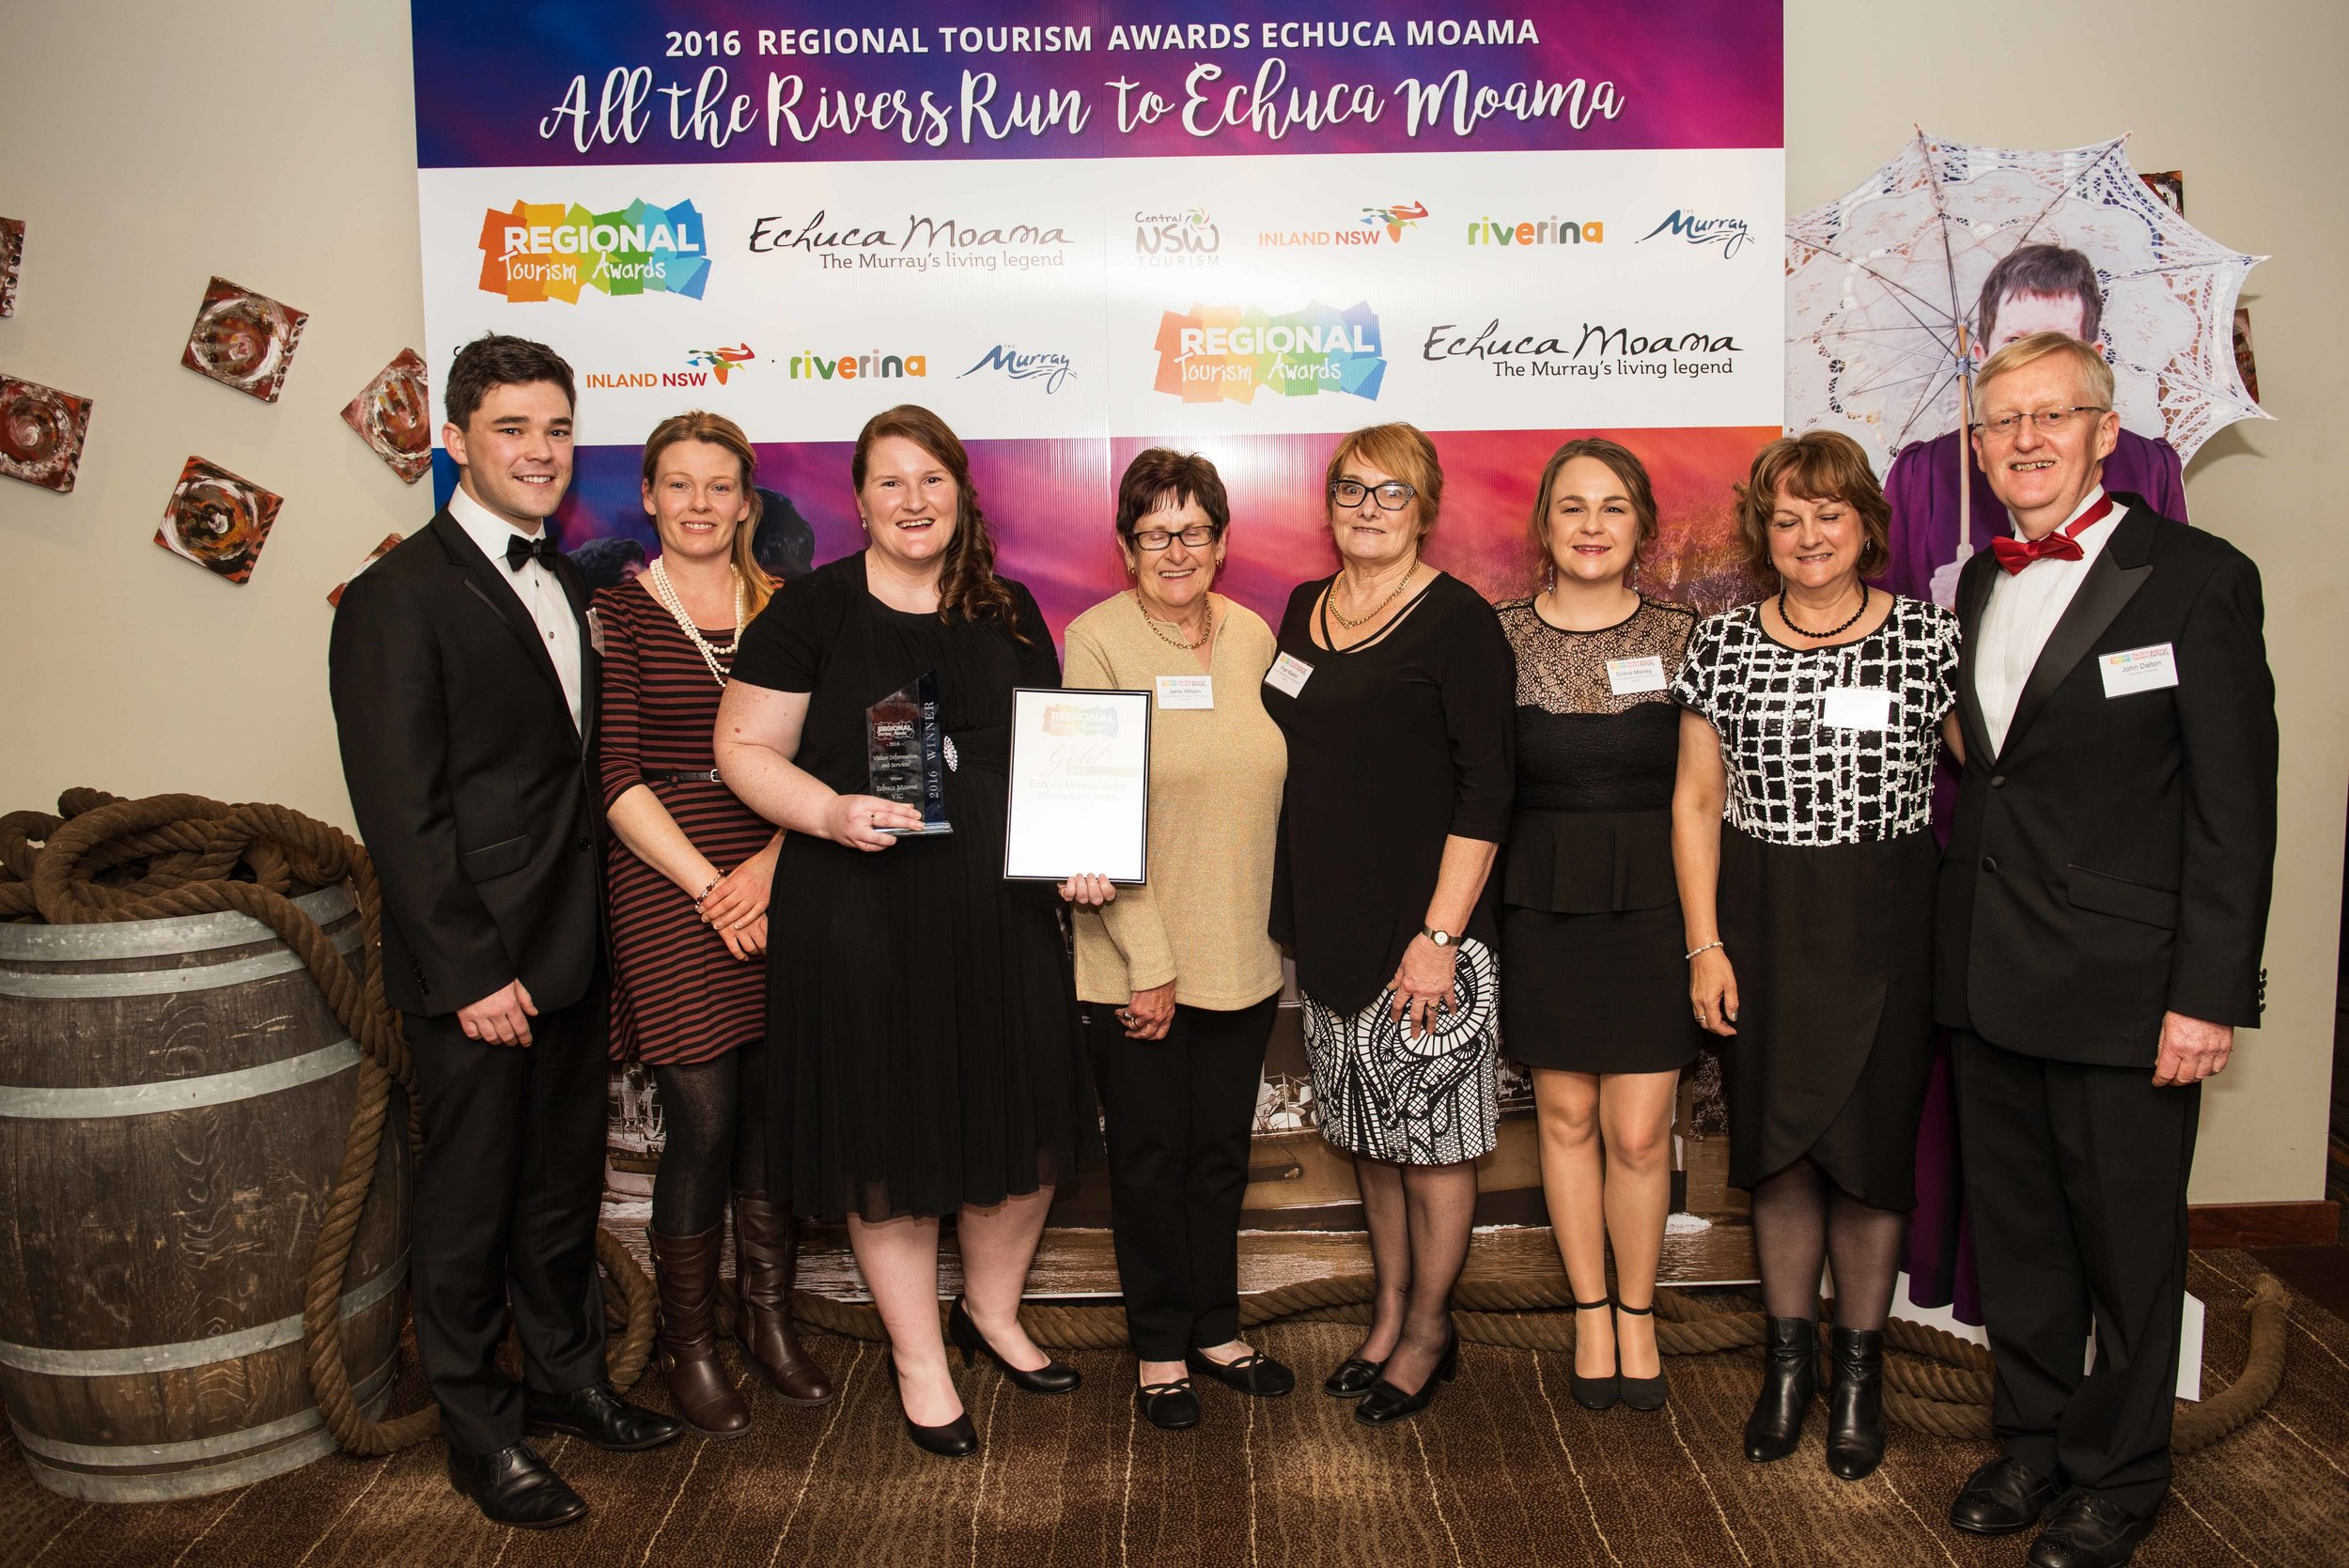 Tourism industry representatives at Regional Tourism Award 2016